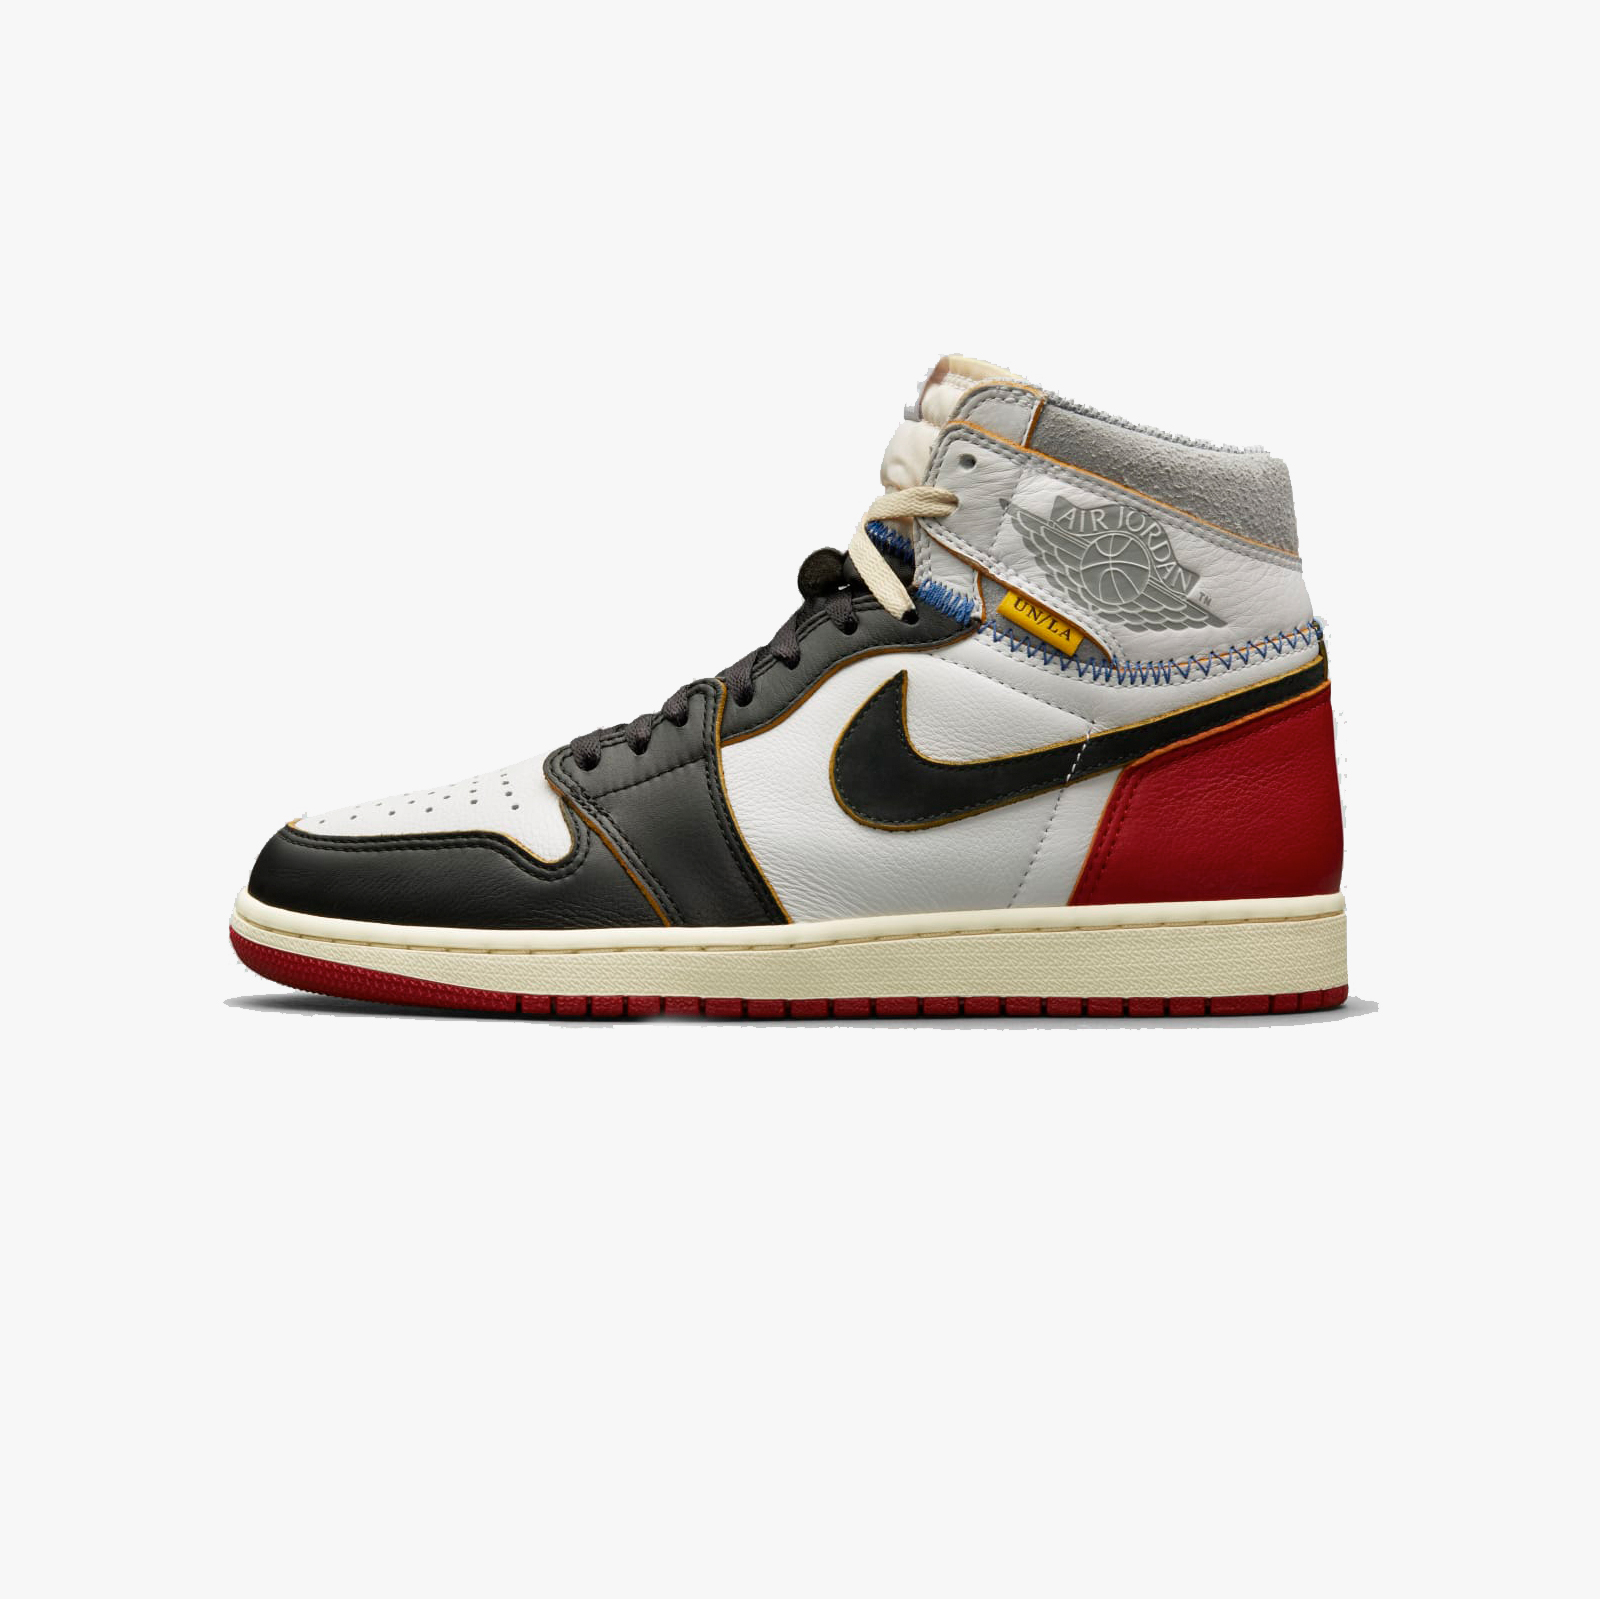 69b430ca254e Jordan Brand Air Jordan 1 Retro Hi NRG   Union - Bv1300-106 -  Sneakersnstuff